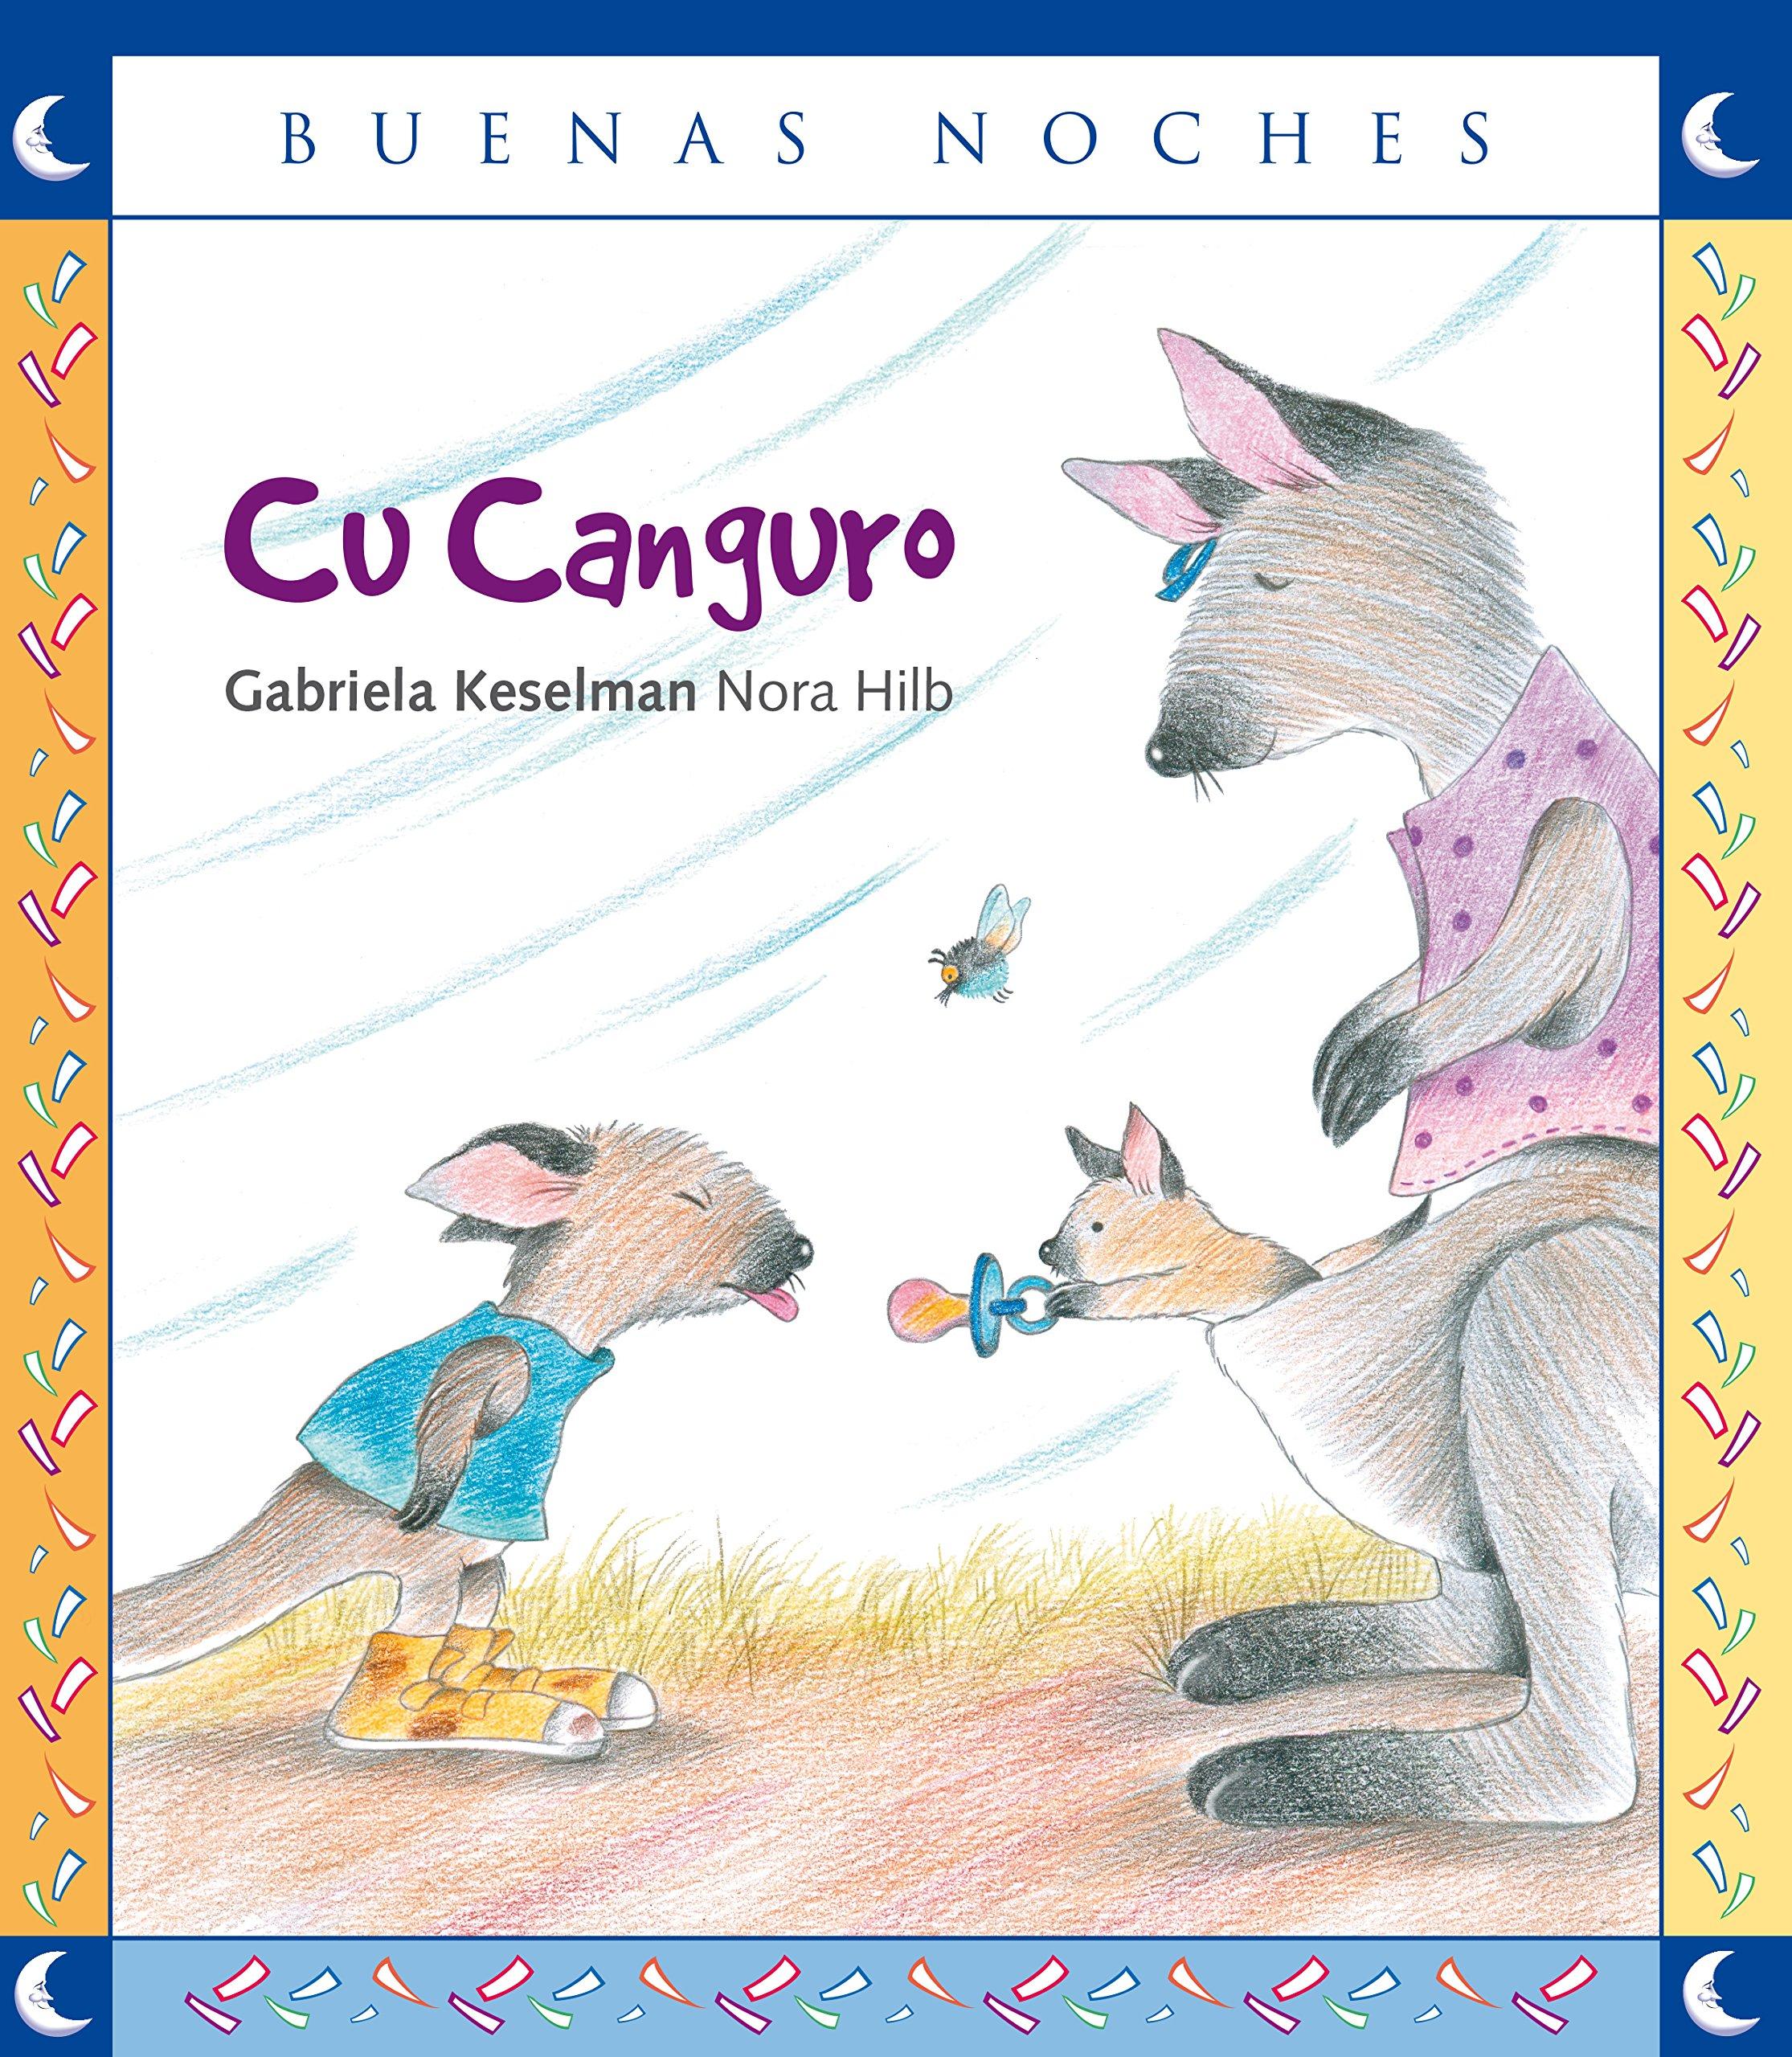 Download Cu Canguro / Koo Kangaroo (Buenas noches) Spanish Edition (Buenas noches/ Goodnight) pdf